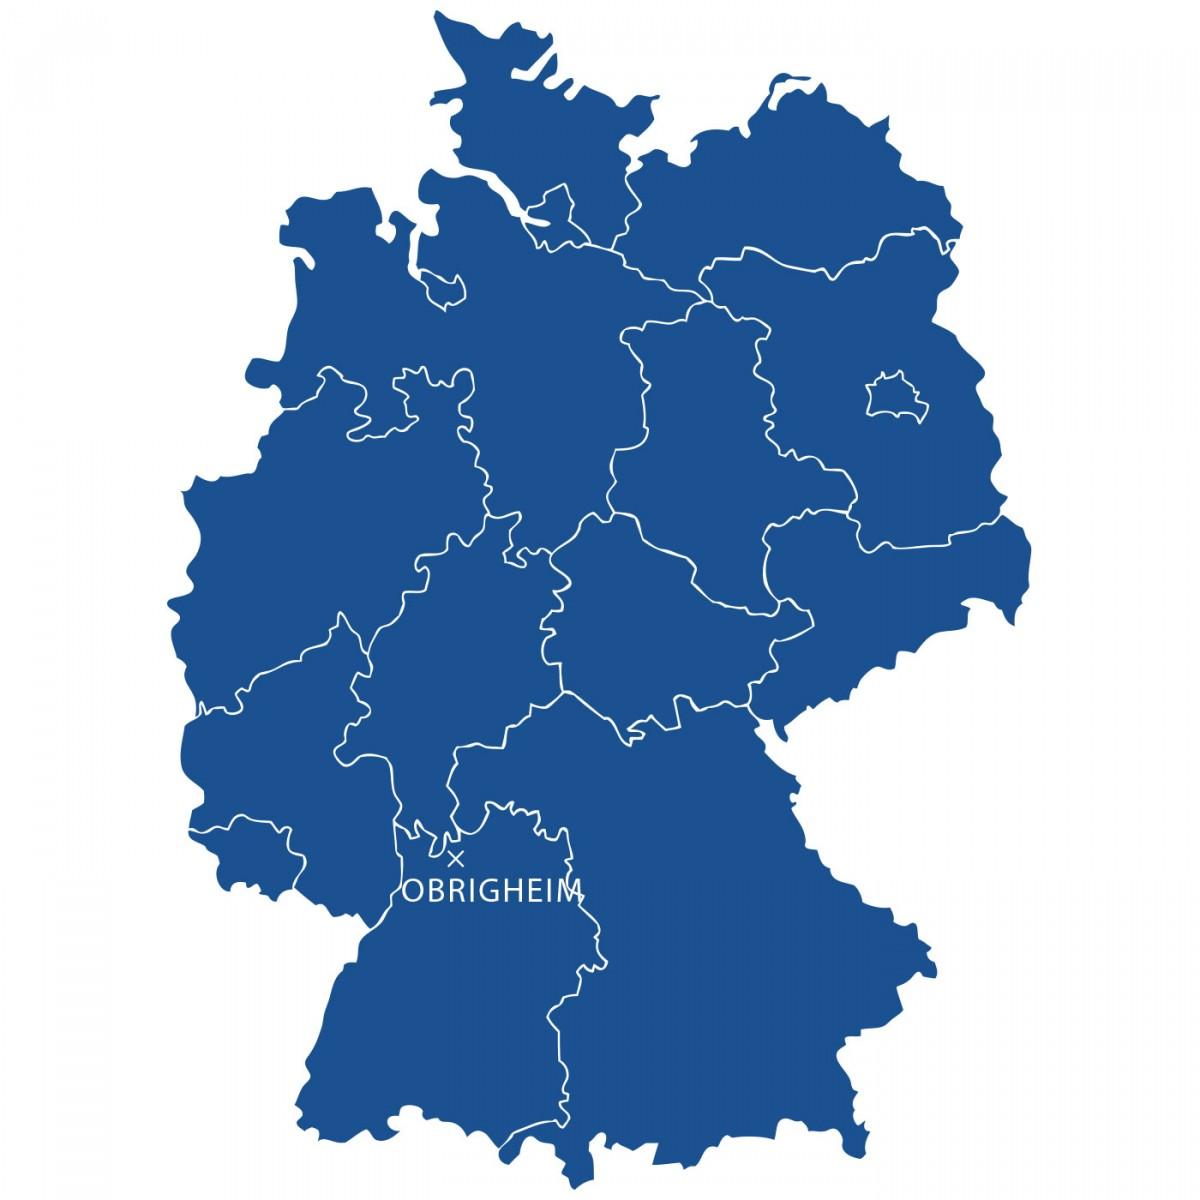 Obrigheim KWO